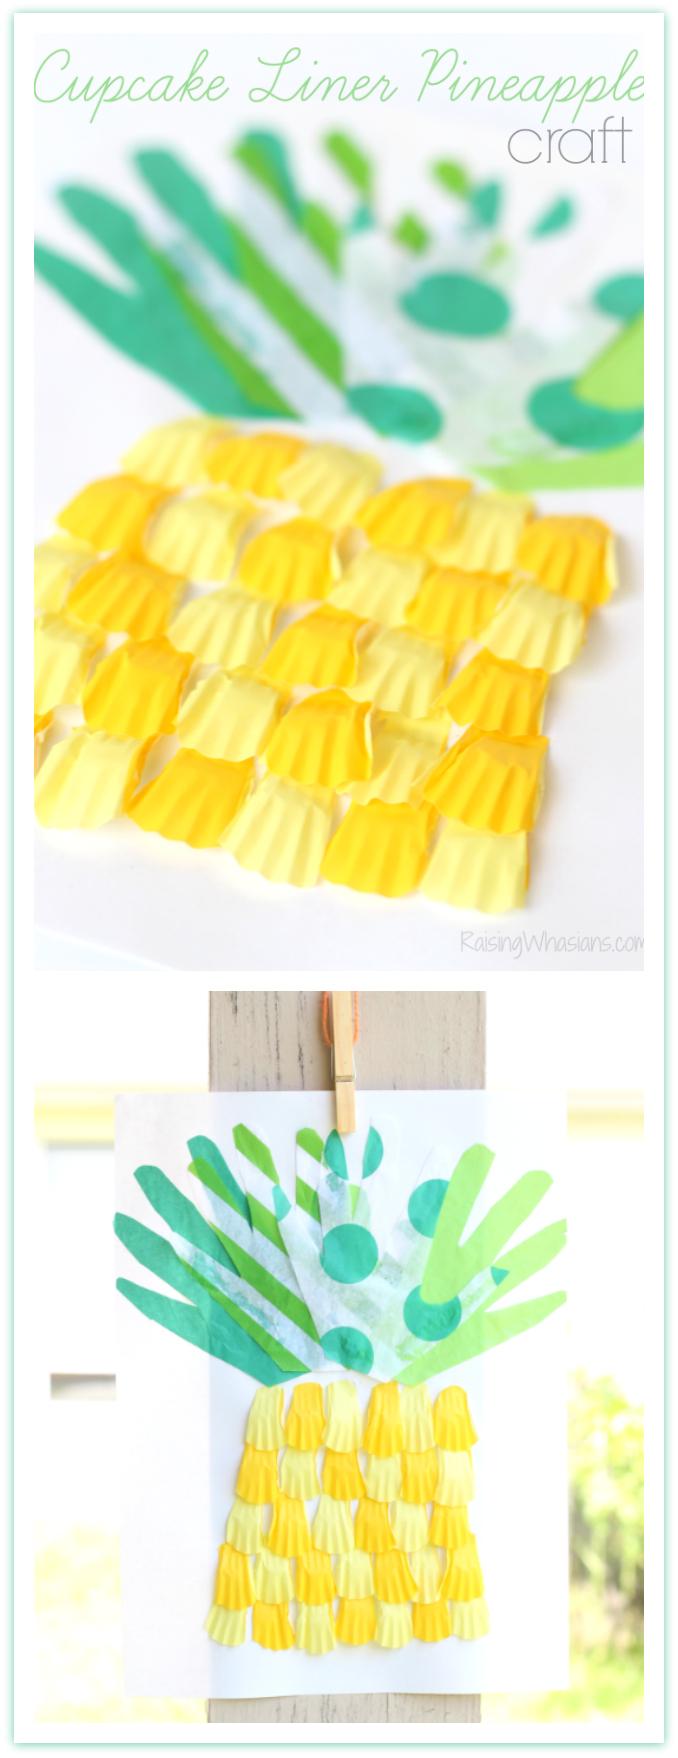 Cupcake liner pineapple craft